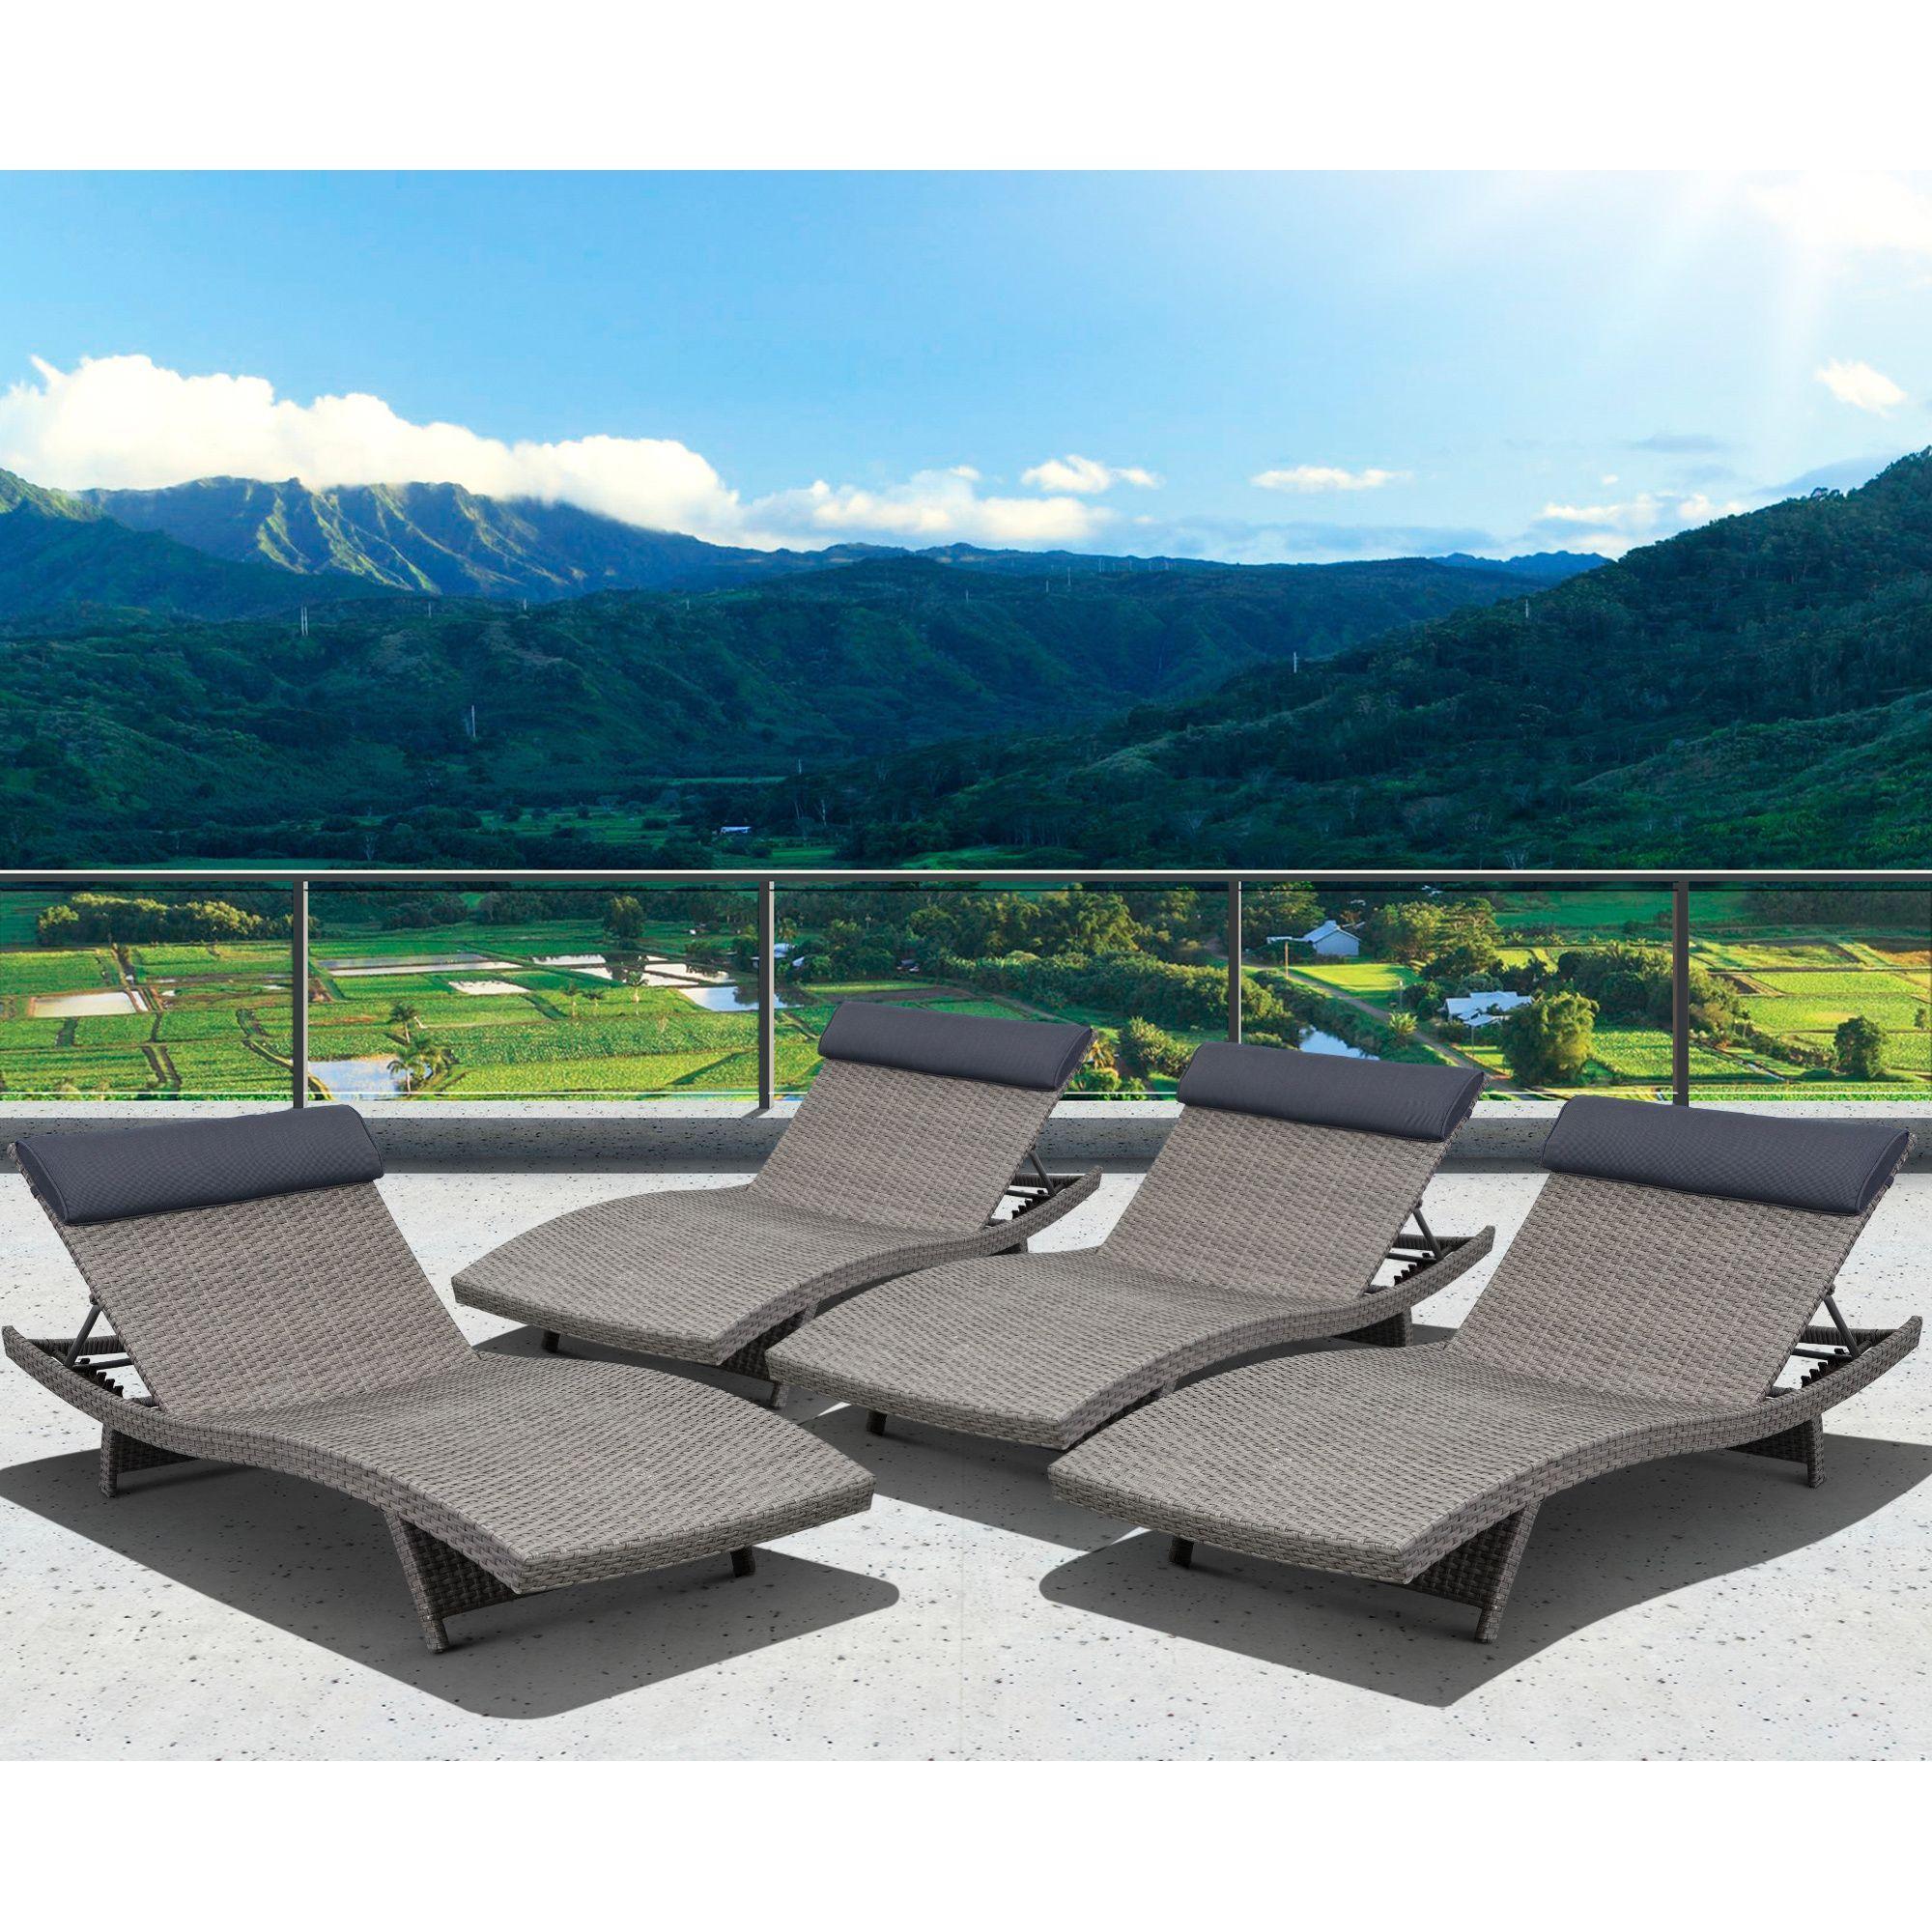 Atlantic Mykonos 4 Piece Grey Deluxe Loungers (Grey, Dark Grey, 80x30x15), Patio Furniture (Aluminum)